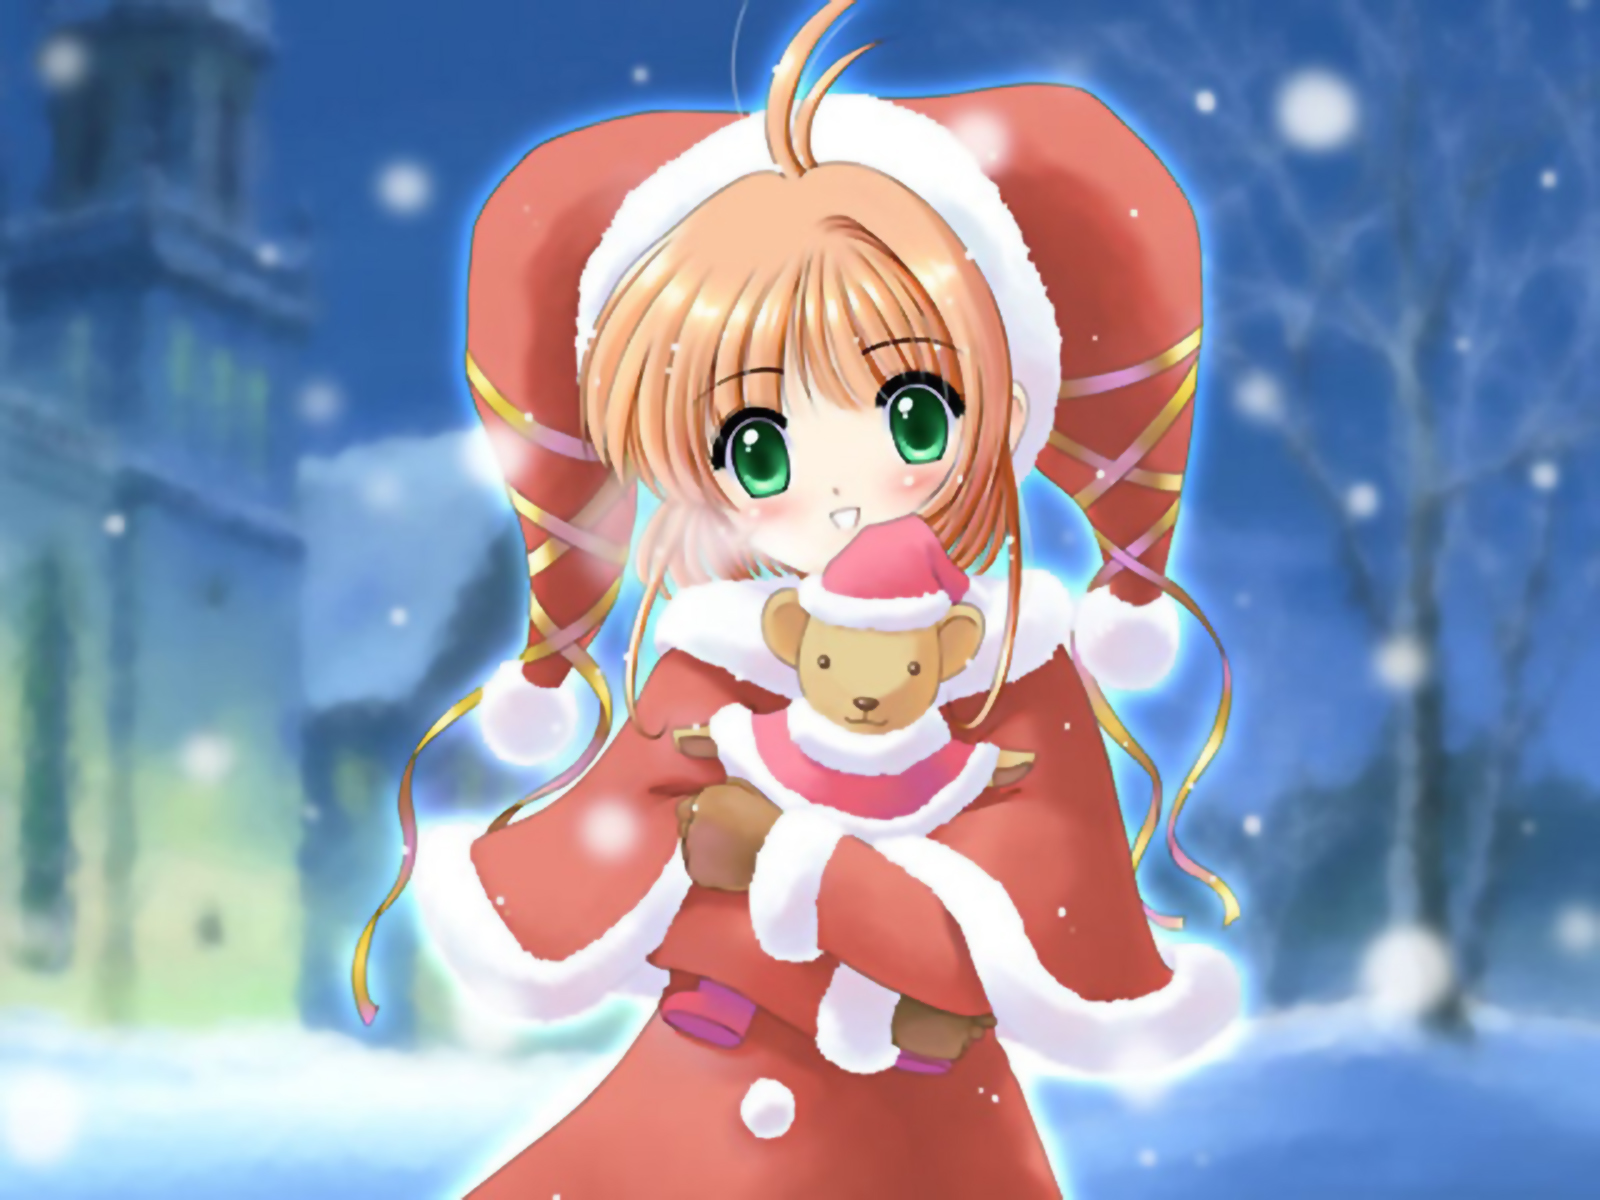 card_captor_sakura christmas green_eyes hat kinomoto_sakura orange_hair teddy_bear